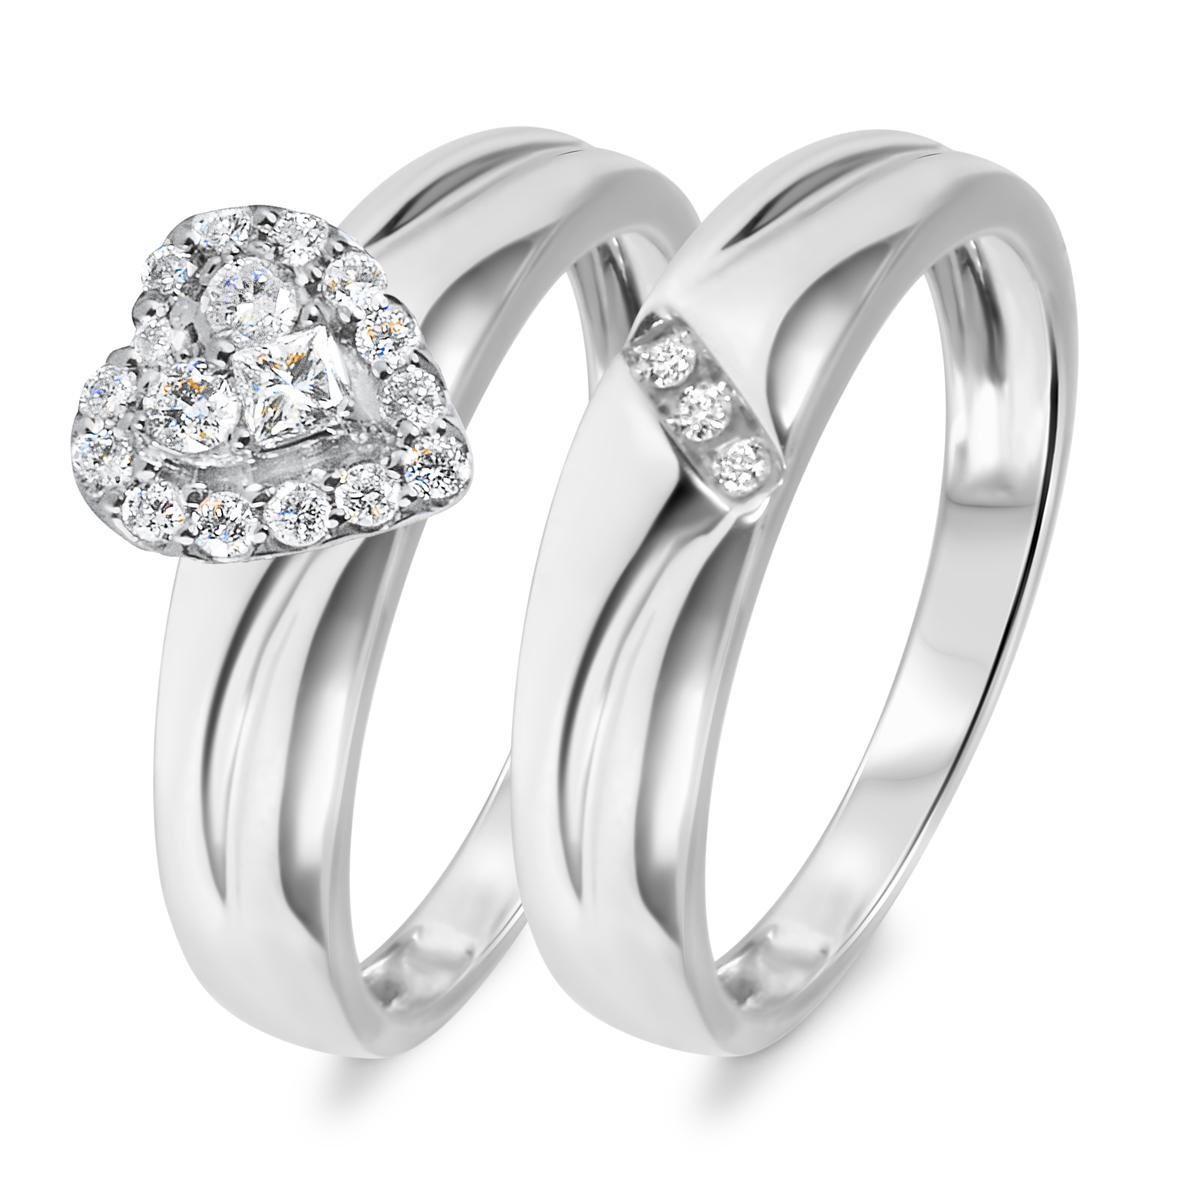 1/3 CT. T.W. Diamond Women's Bridal Wedding Ring Set 14K White Gold